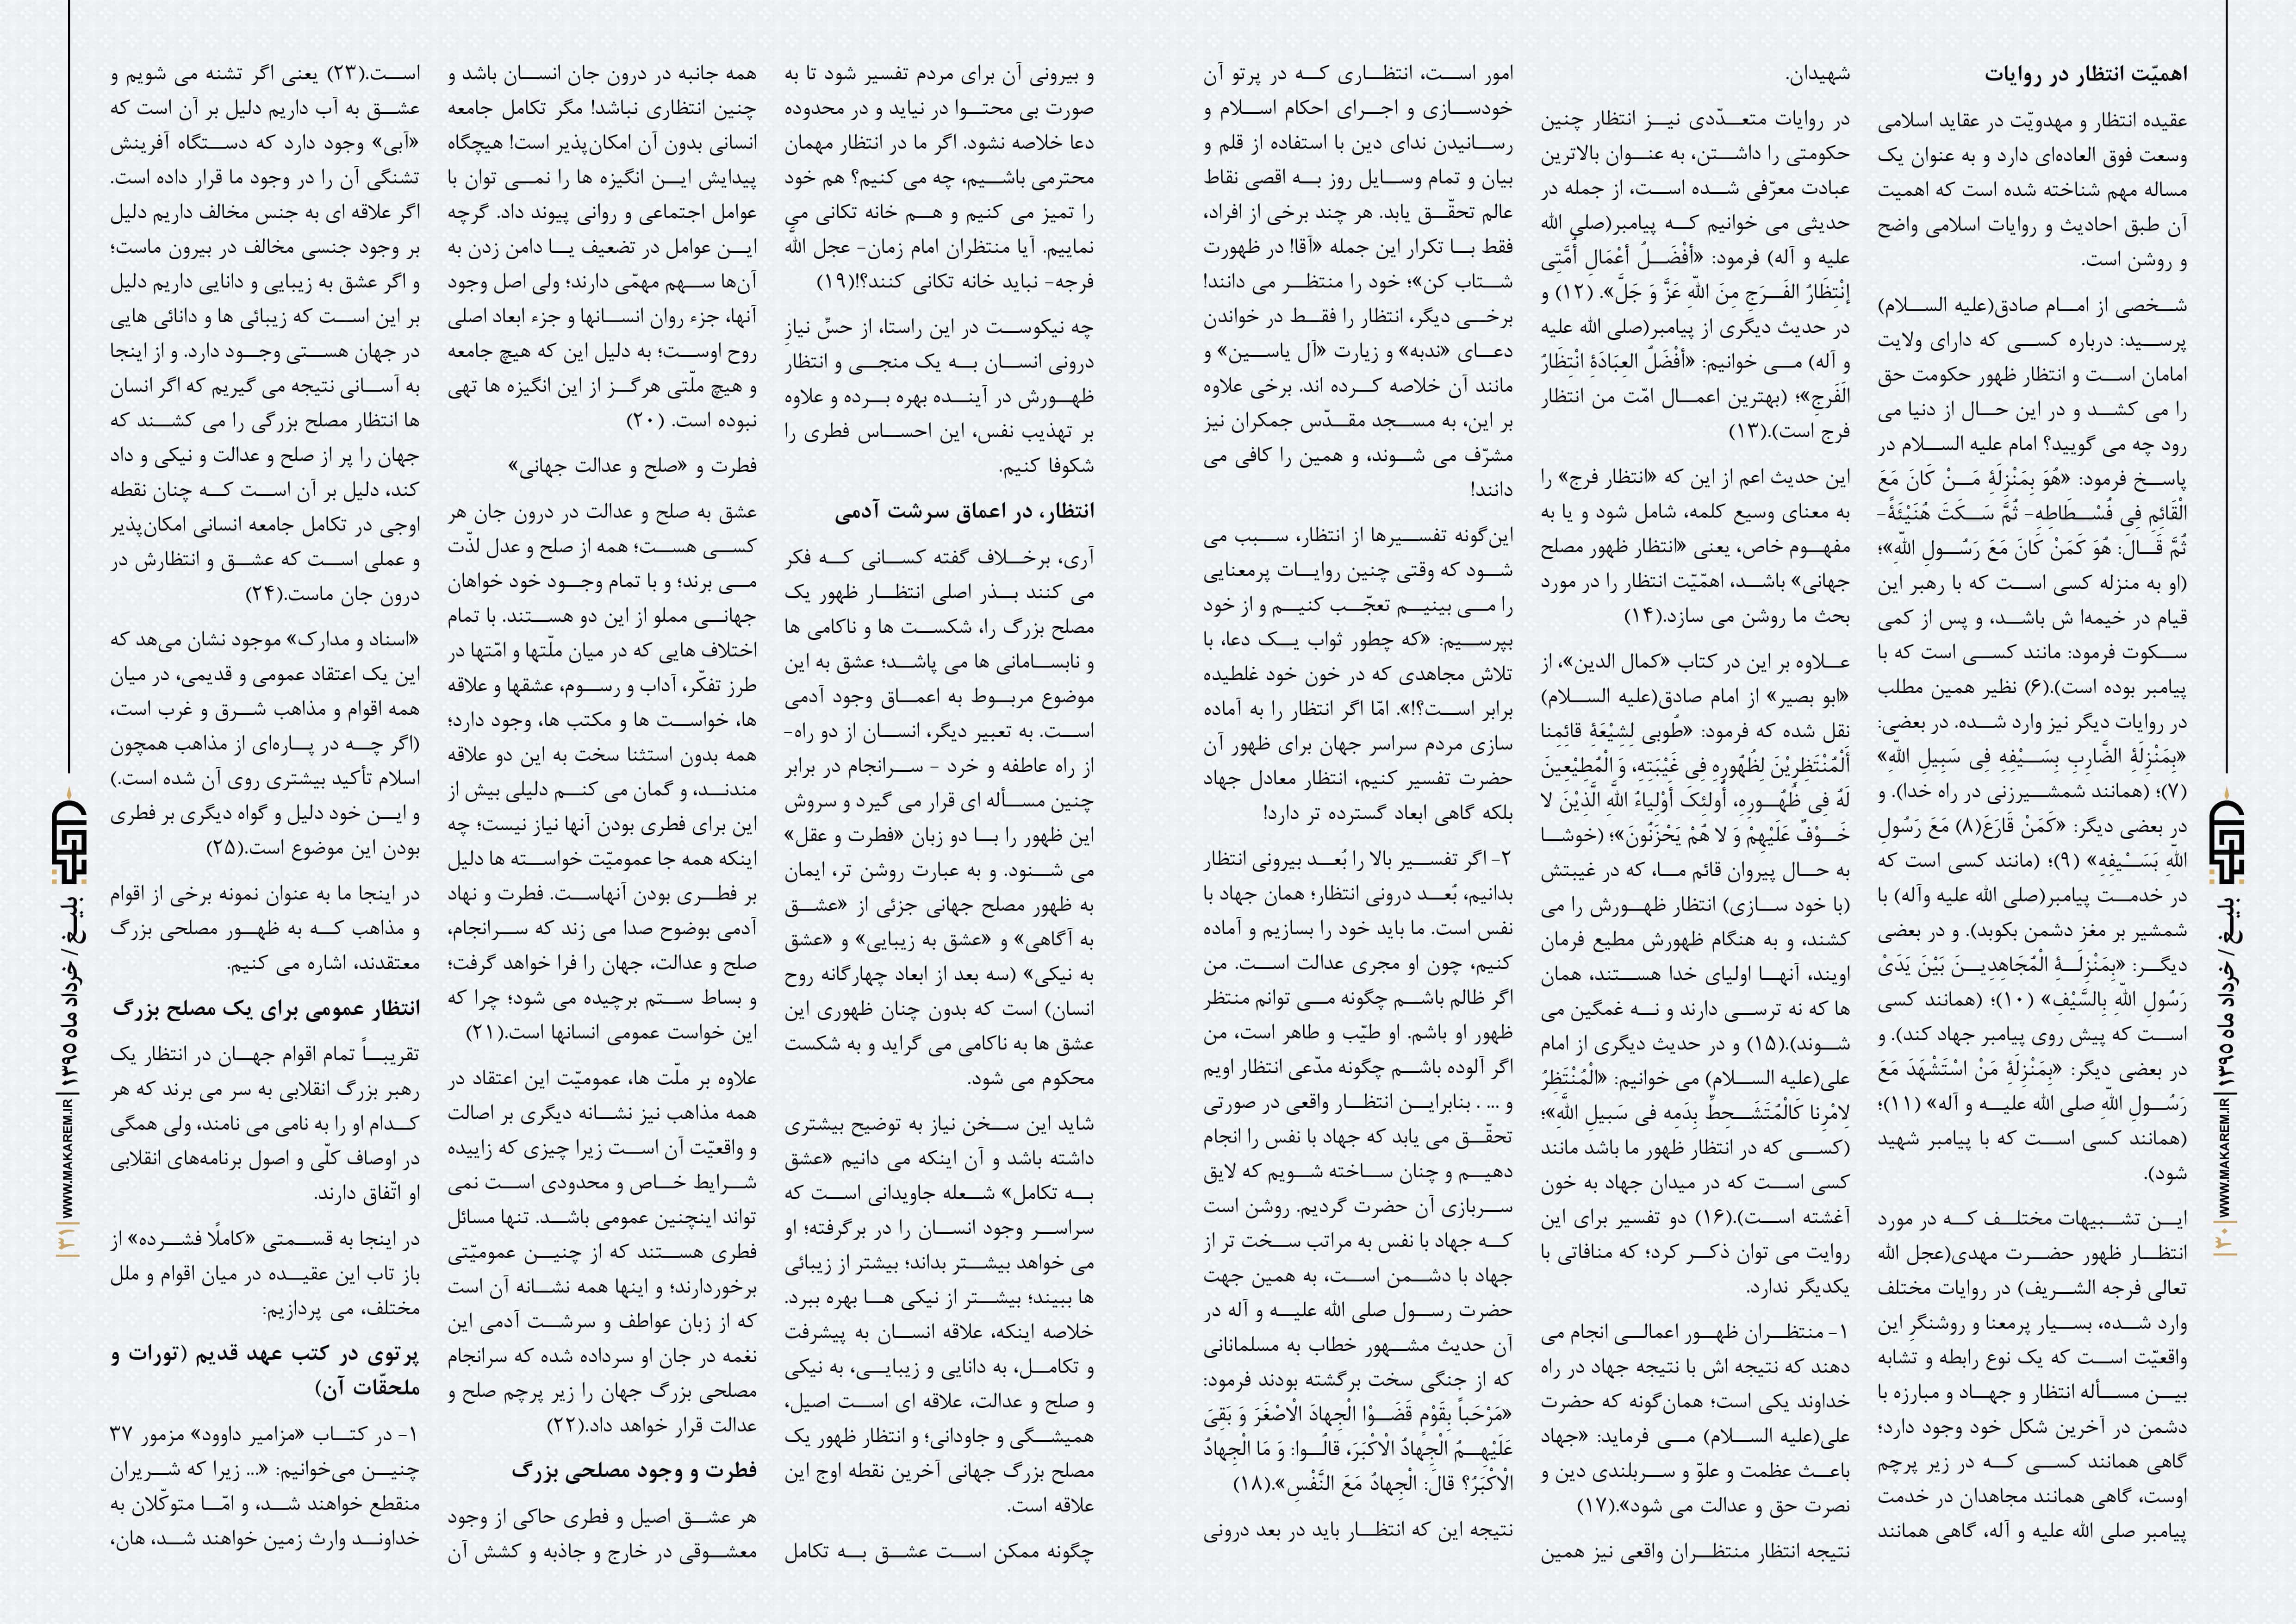 بلیغ 16-مدرسه الامام امیر المومنین (ع)